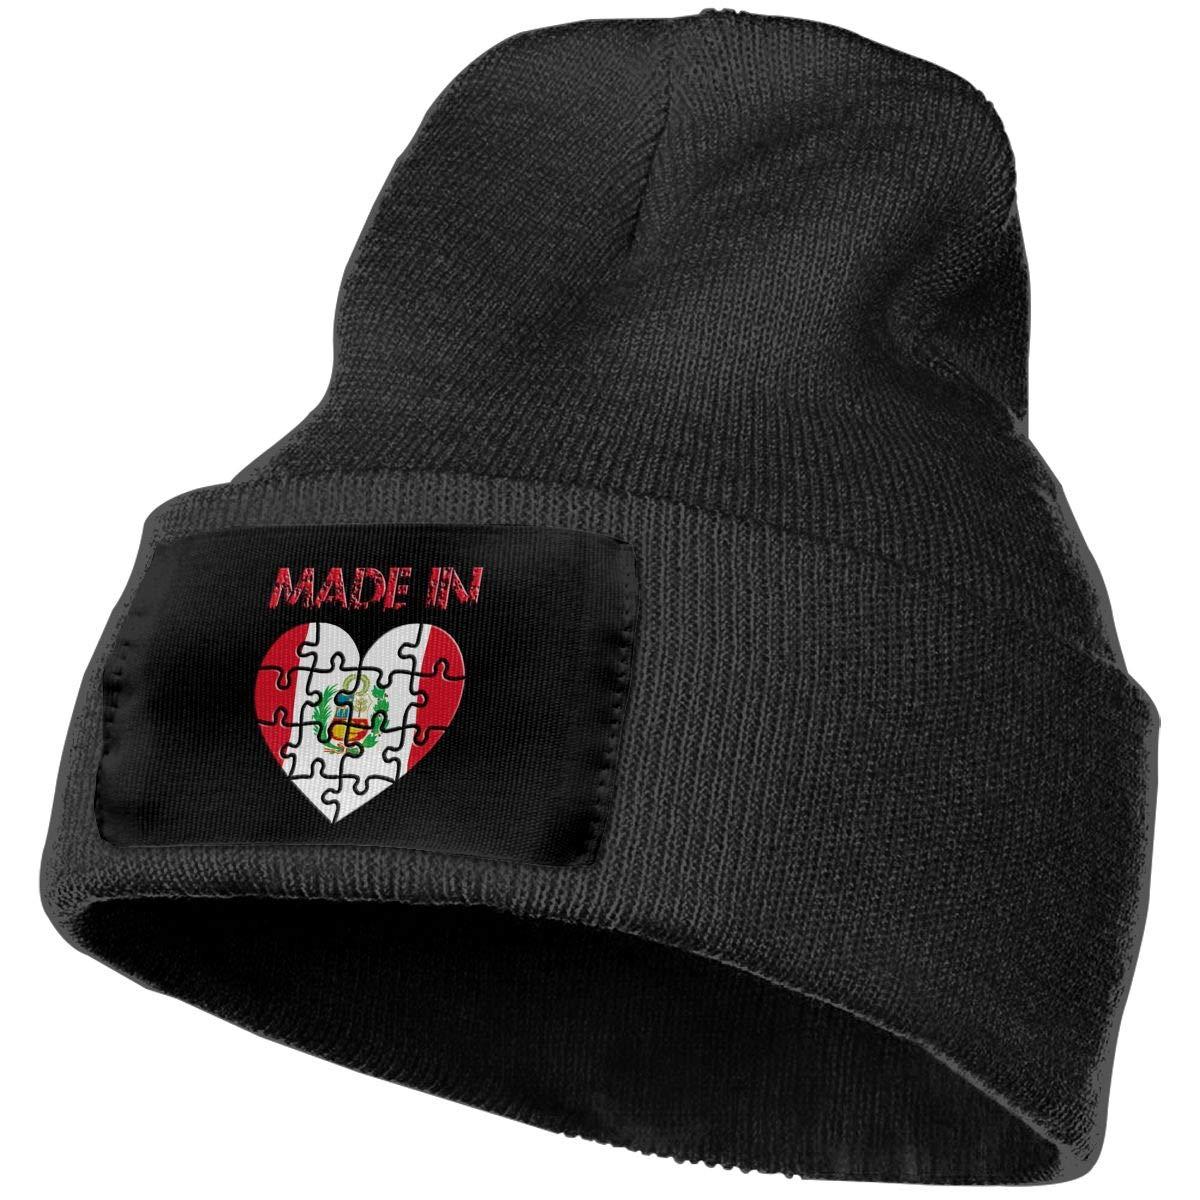 Men /& Women Made in Peru Outdoor Warm Knit Beanies Hat Soft Winter Knit Caps